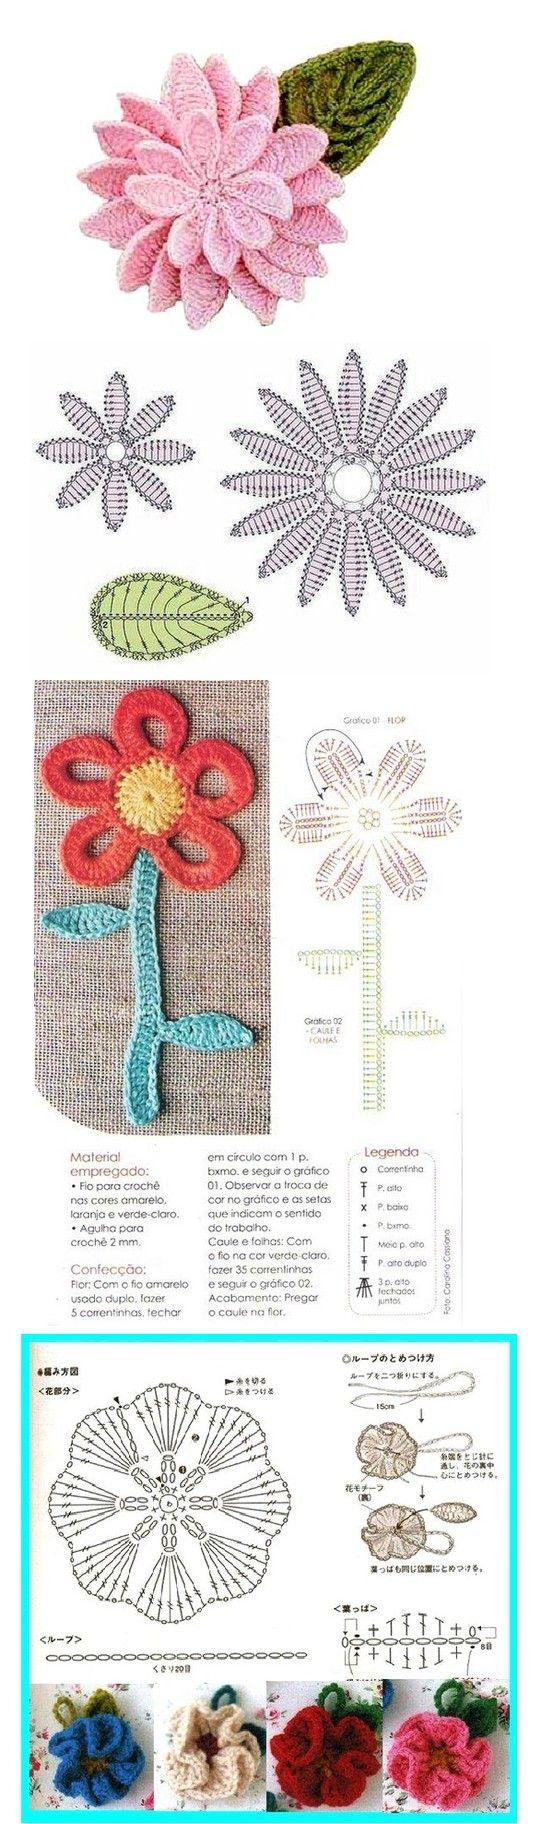 Is it spring already? nice crochet!